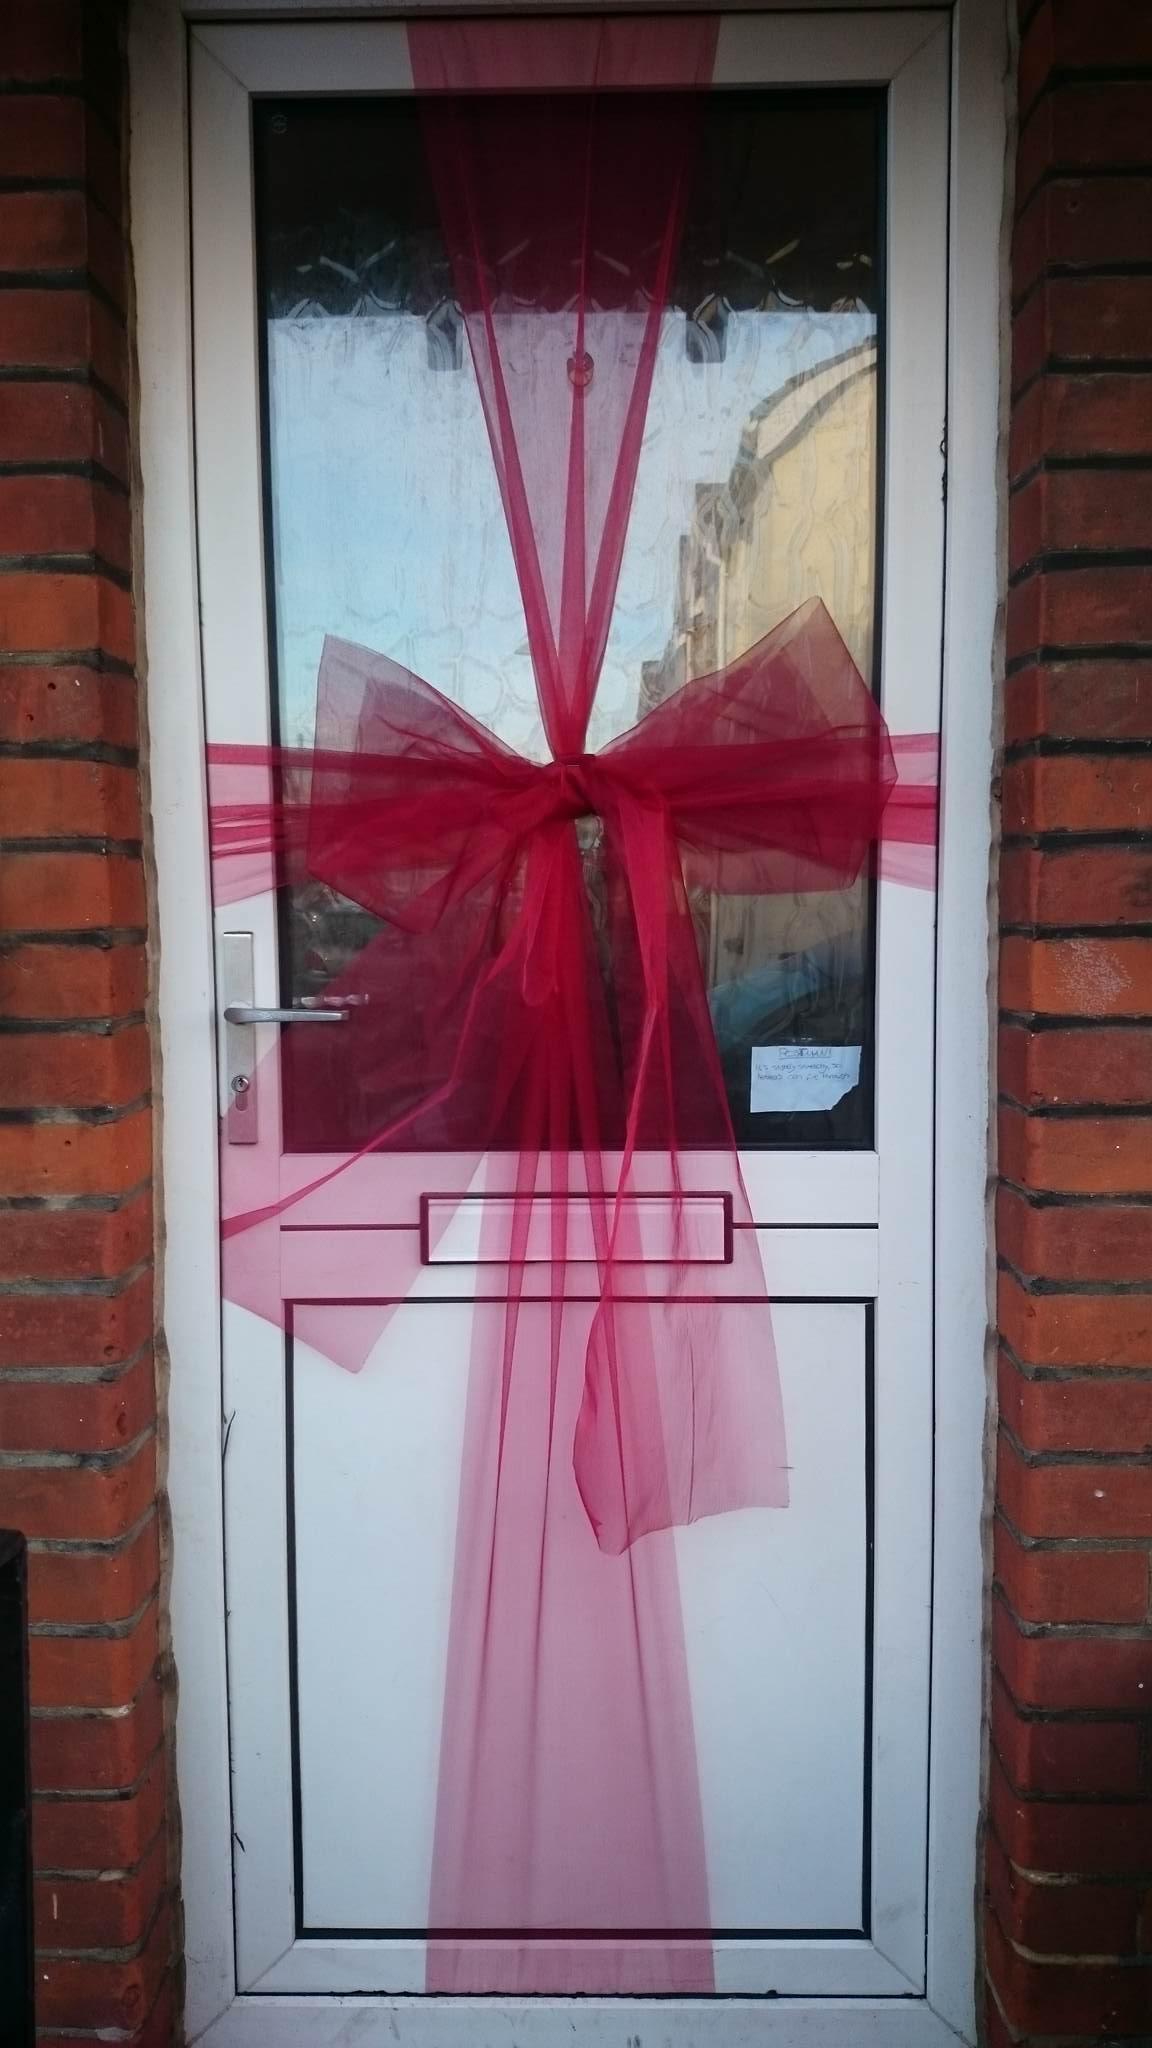 & Blogmas #12 How to Make a Christmas Door Bow